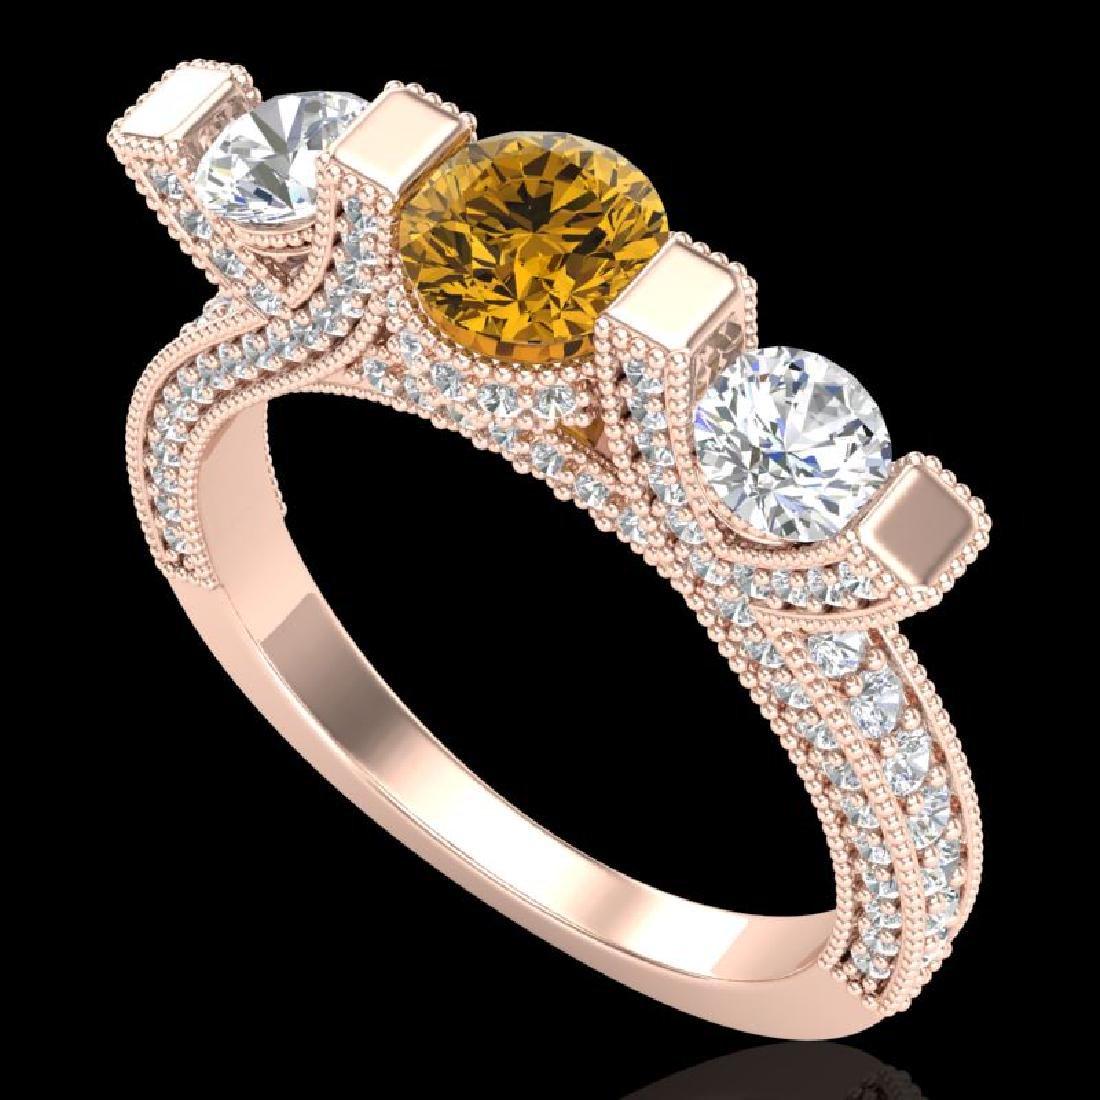 2.3 CTW Intense Fancy Yellow Diamond Micro Pave 3 Stone